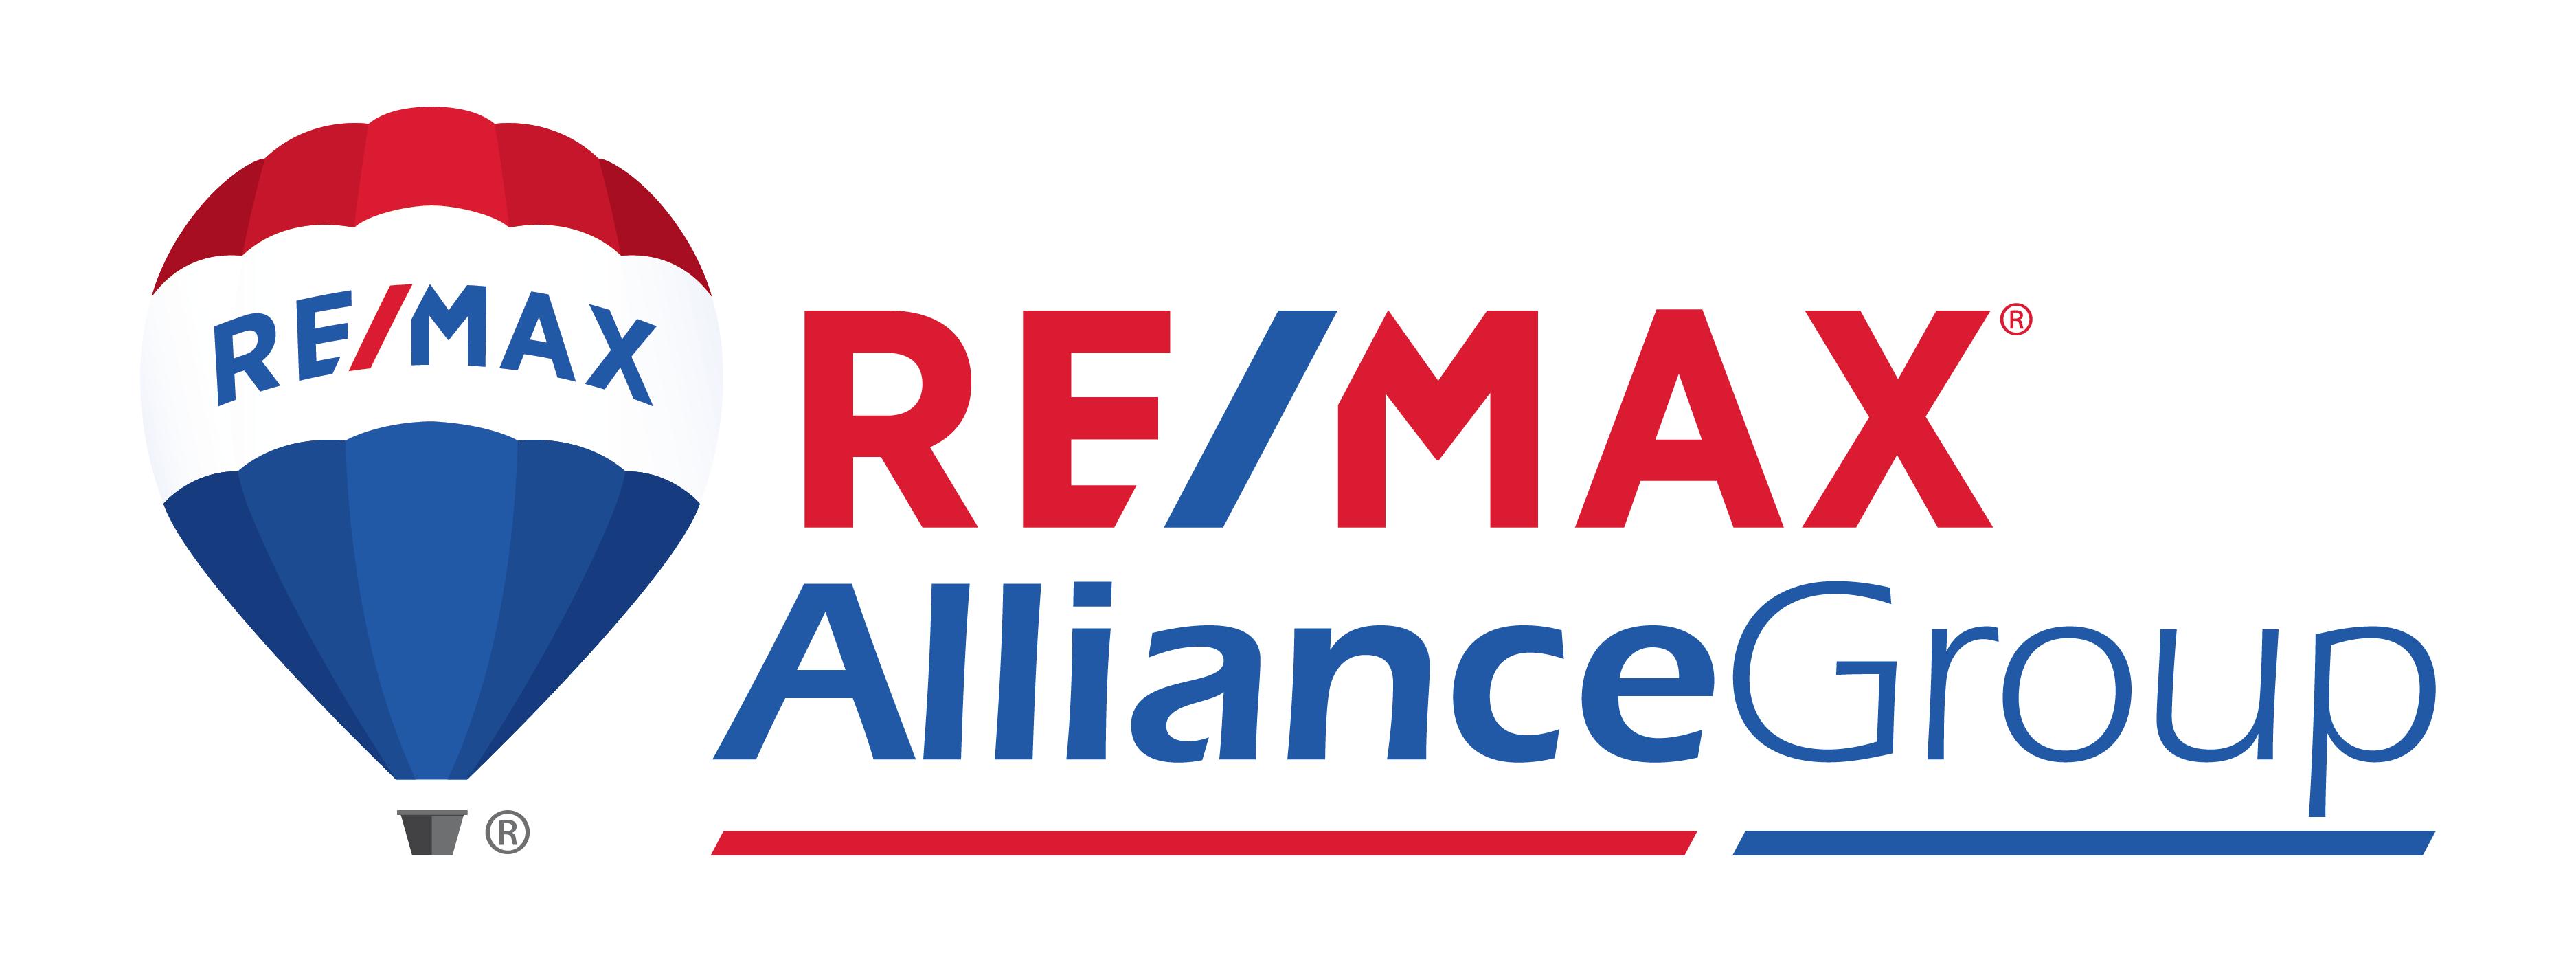 remax alliance group logo